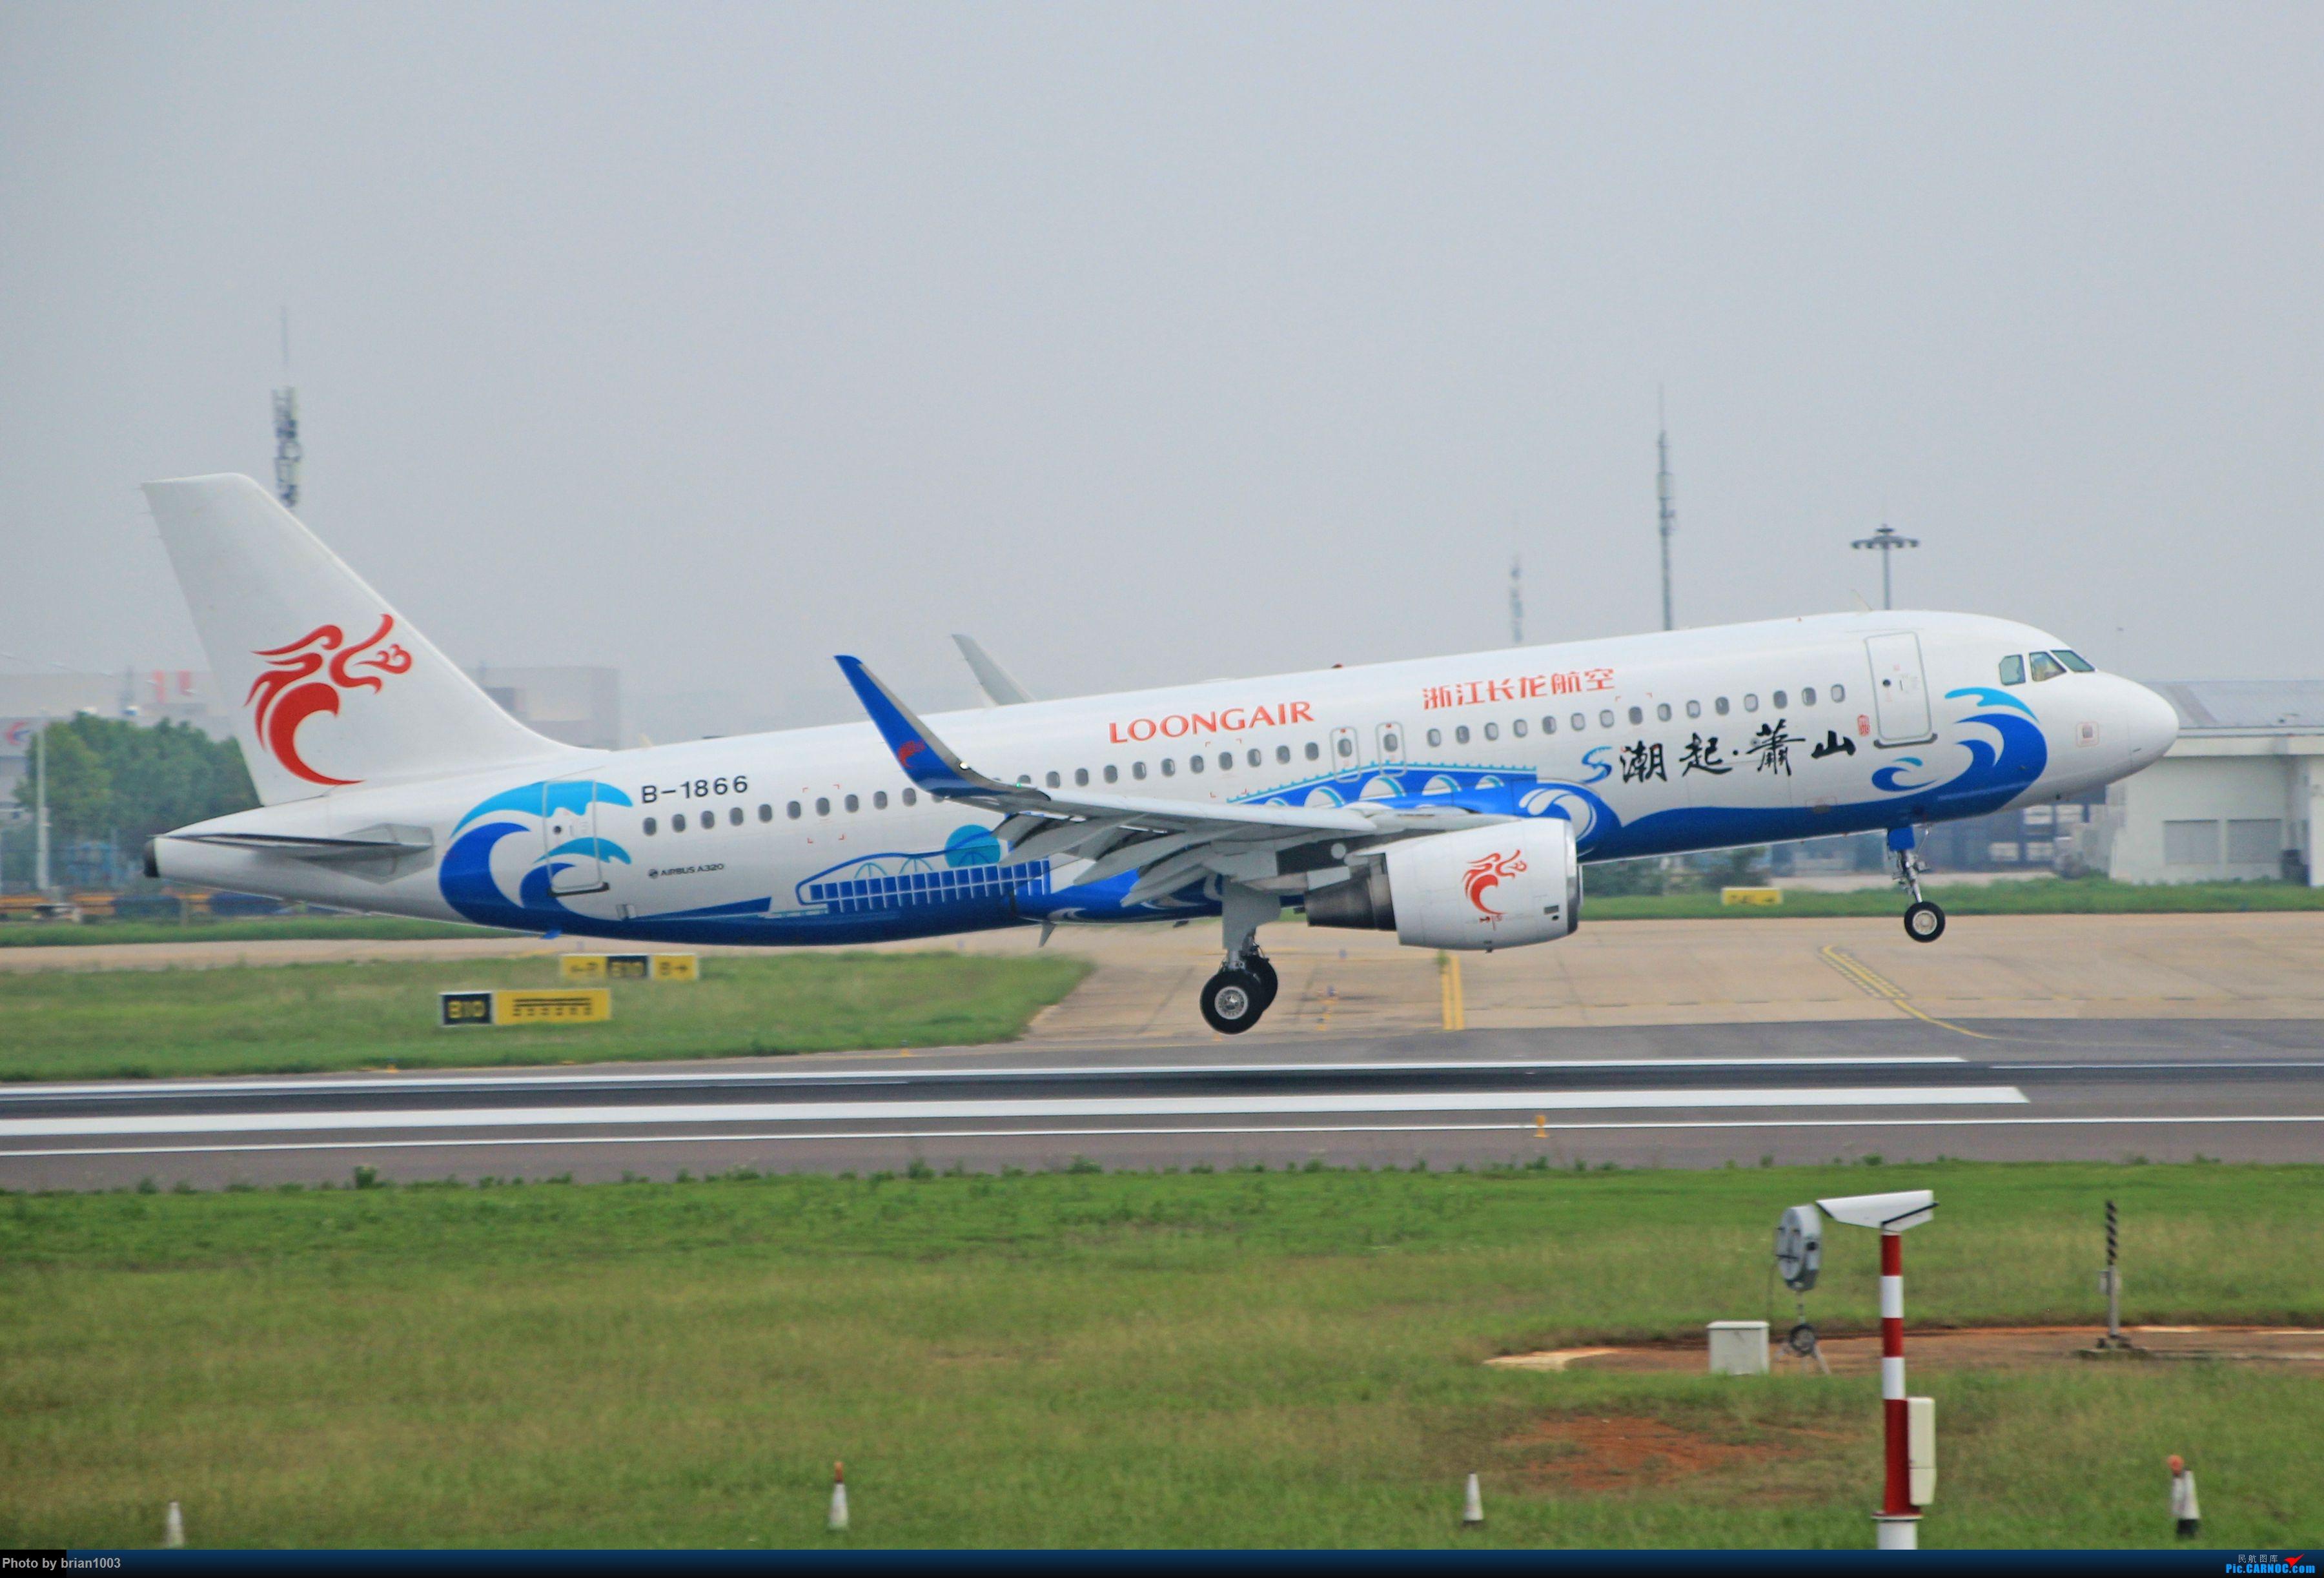 Re:[原创]WUH天河机场拍机之六月还有啥(X7家744F、天津大韩港龙333、巴基斯坦772、B6419、ER-BBJ 74F、某菊塞斯纳、俄航77W) AIRBUS A320-200 B-1866 中国武汉天河国际机场